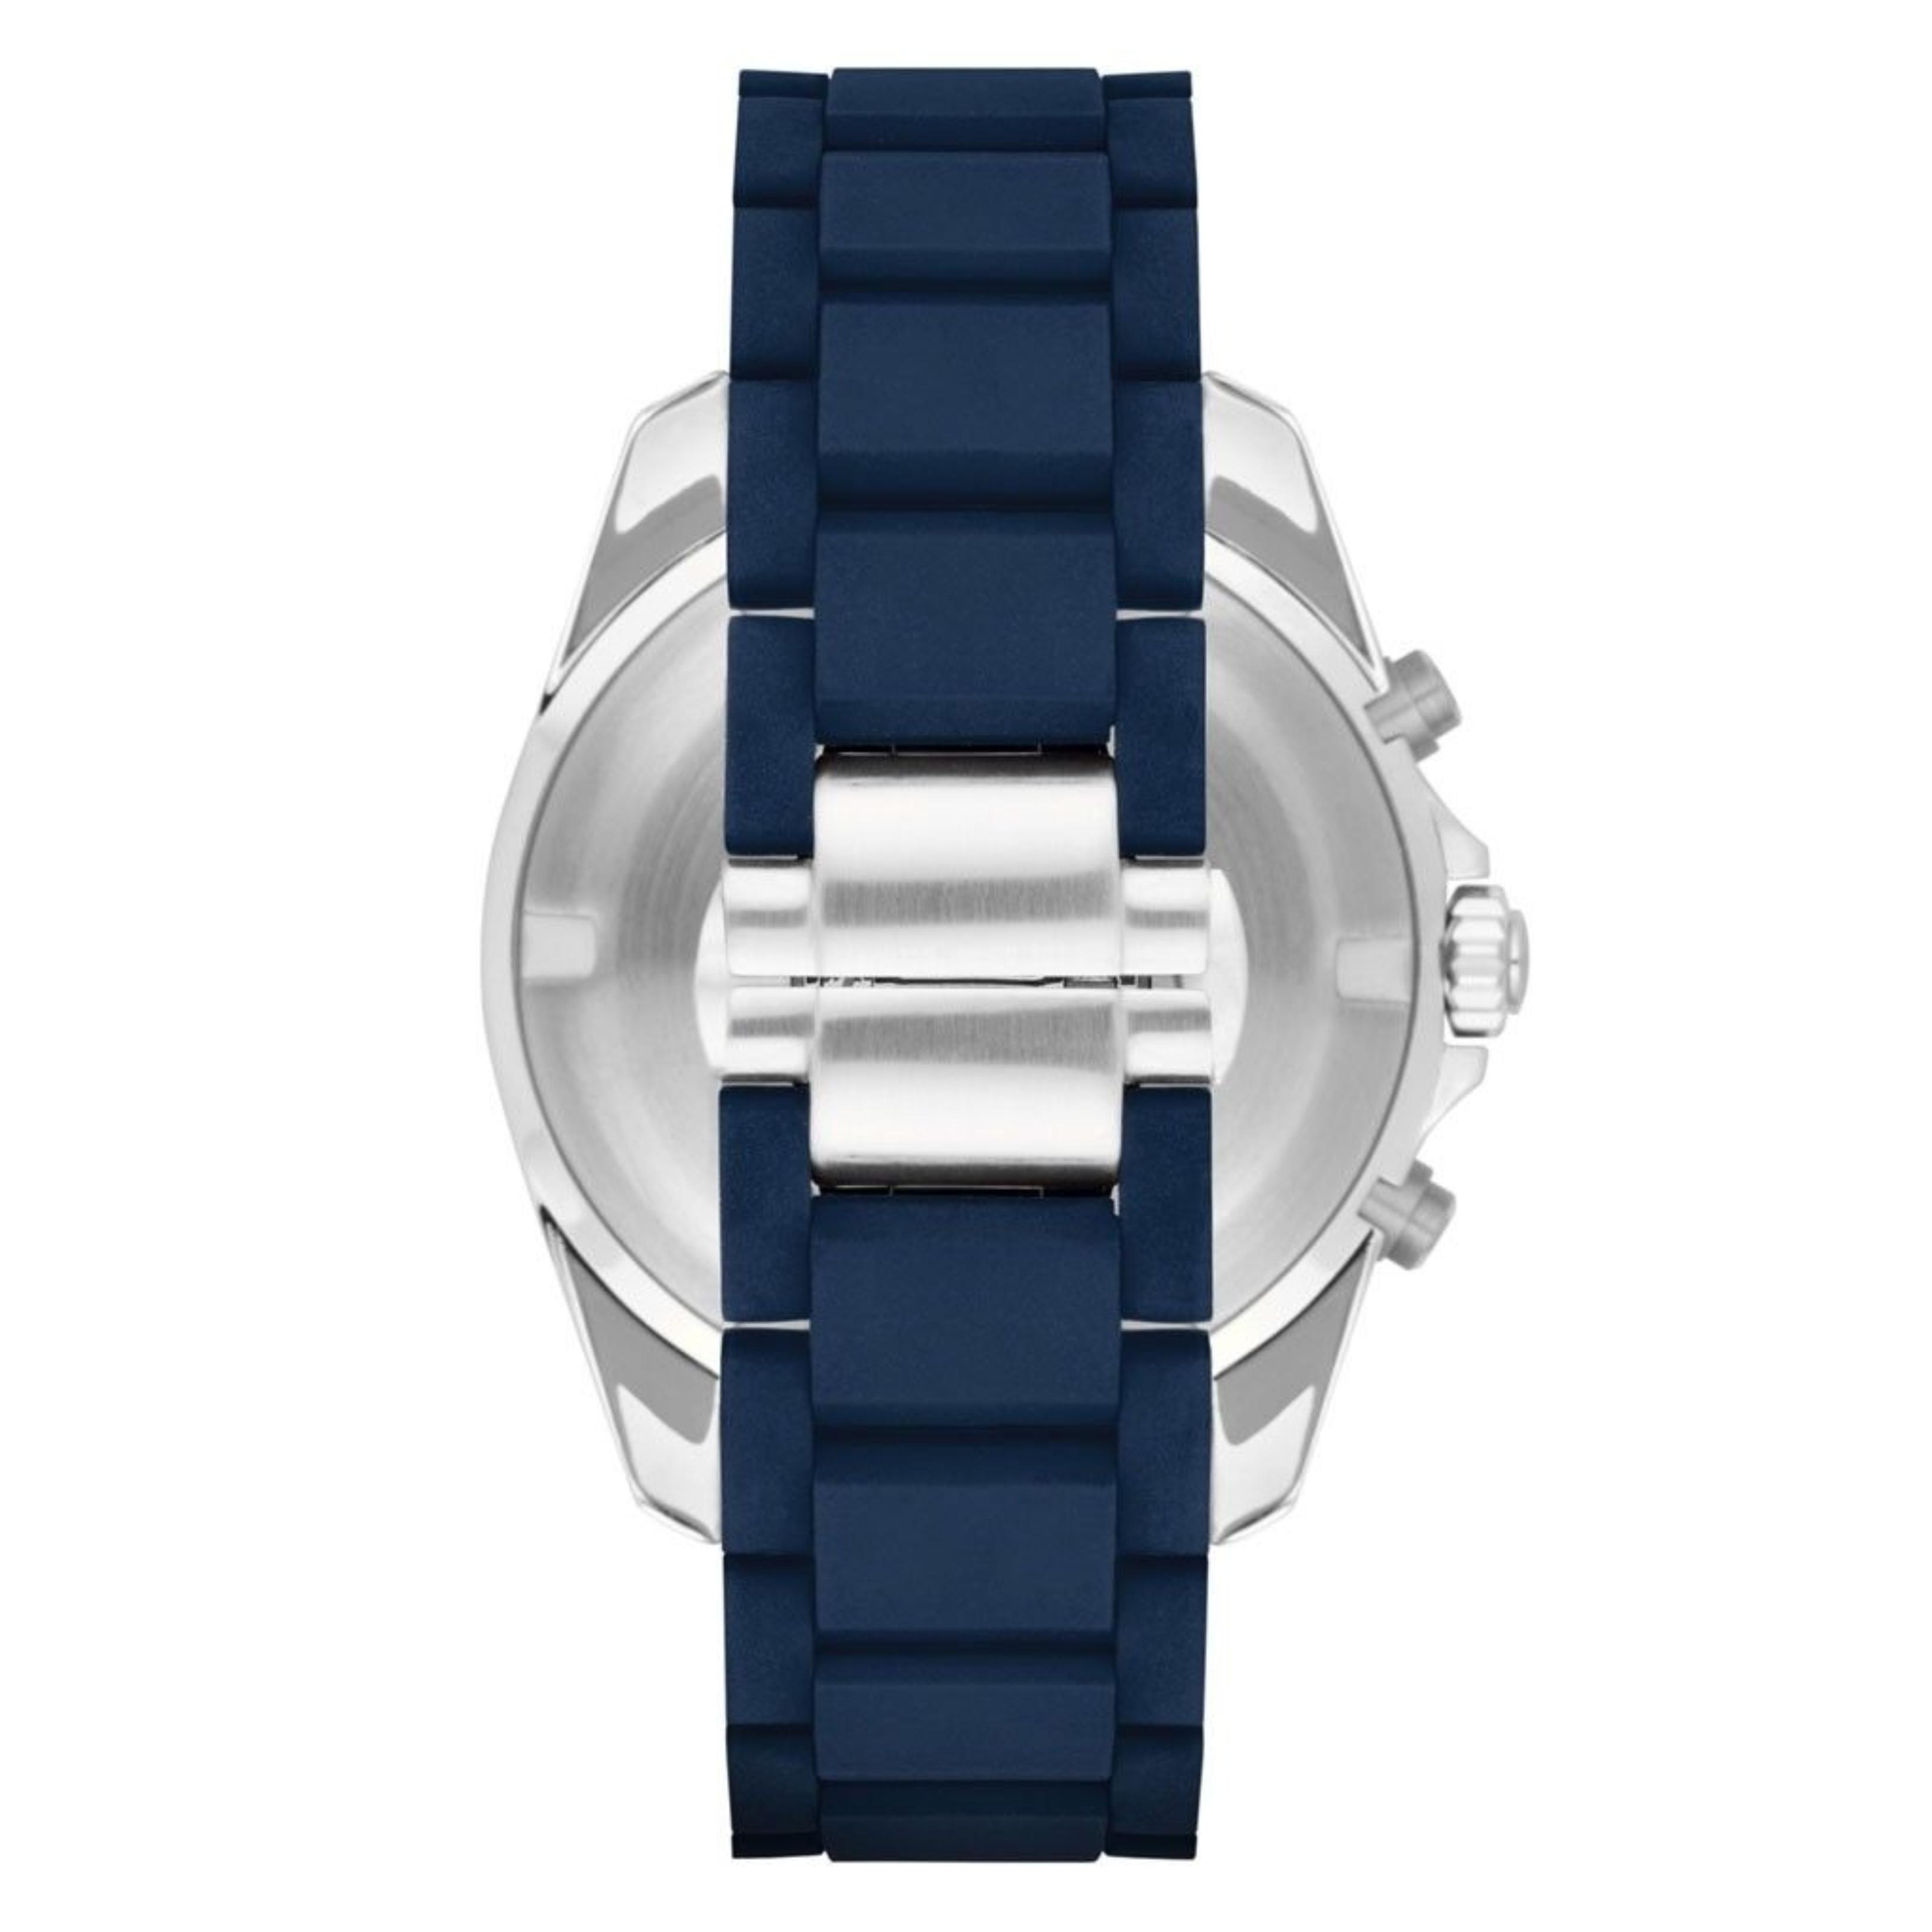 82759aae69f7 CENTINELA Reloj Emporio Armani Sportivo para hombre AR6068│ Cronógrafo con  esfera azul ub Correa de caucho